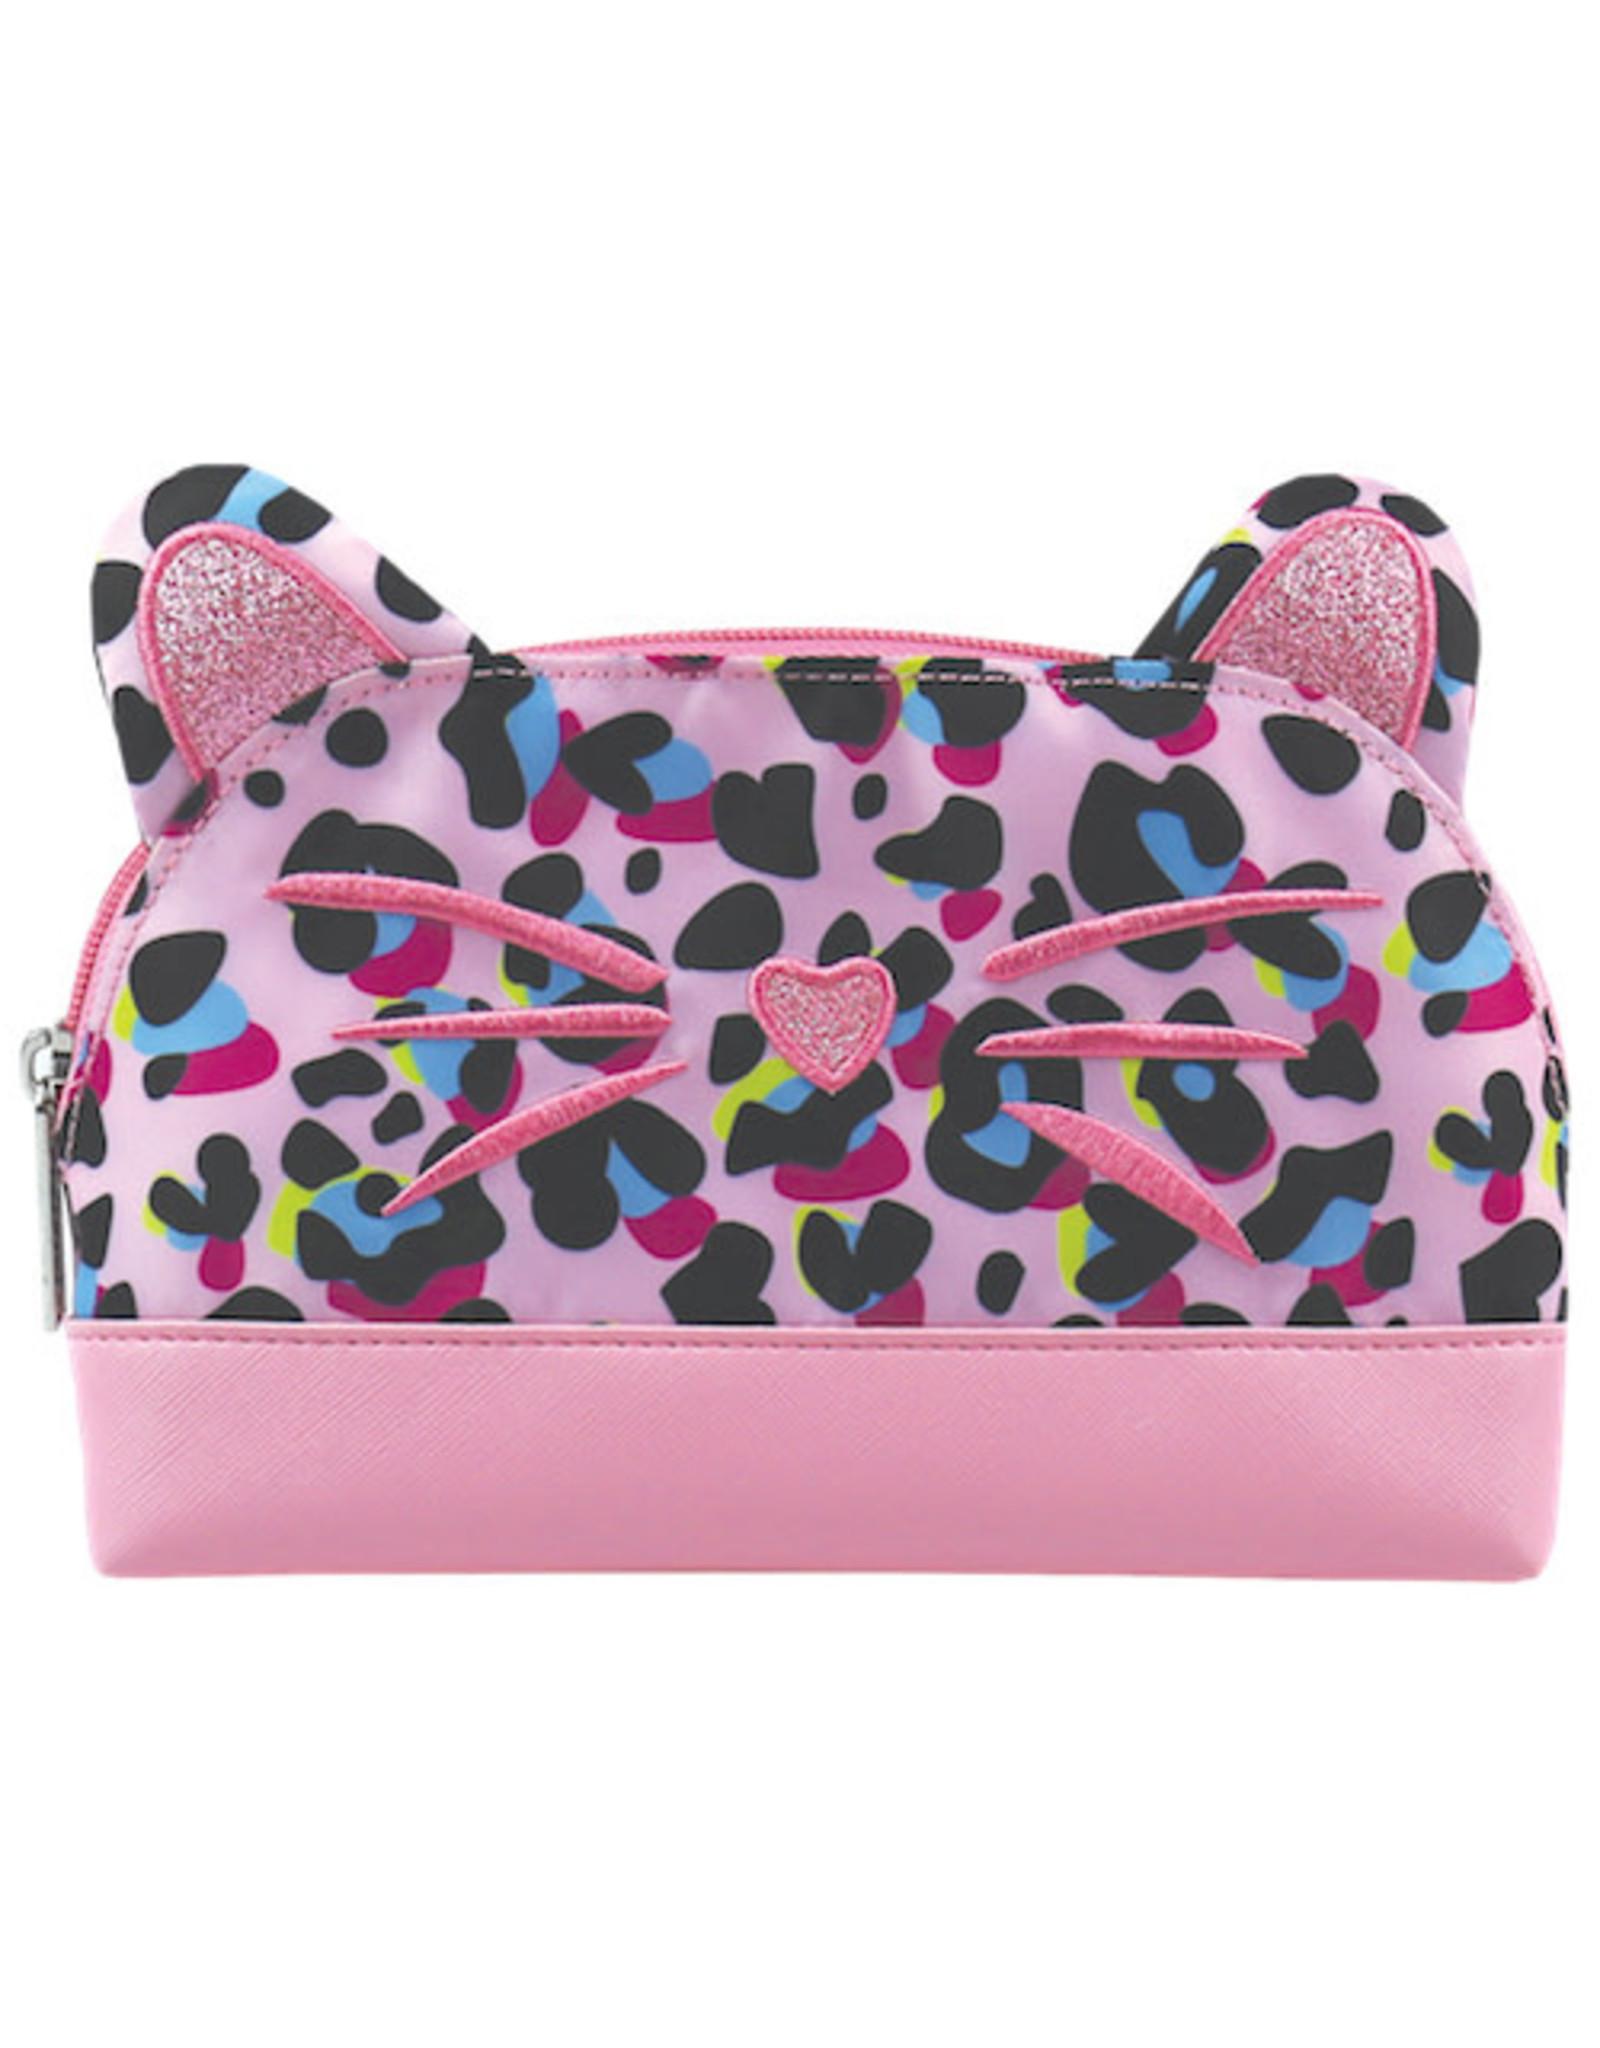 Iscream Oval Cosmetic Bag